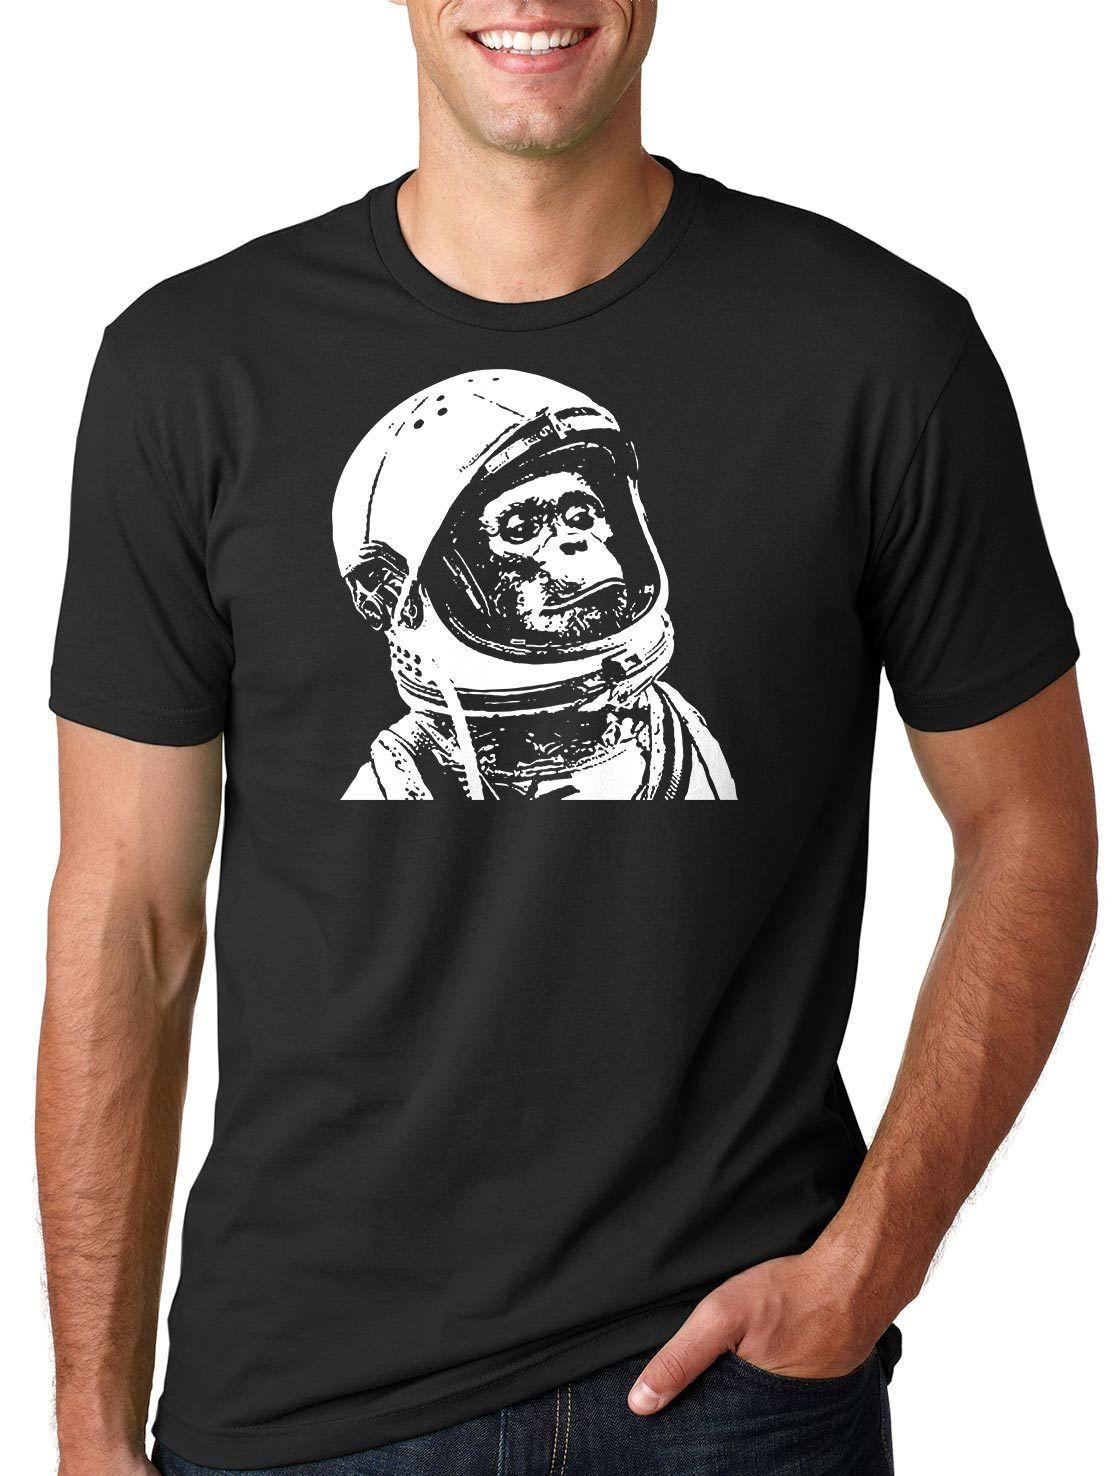 Geek Funny Astronaut Chimp Monkey Tee Shirt Space Monkey Chimpanzee T-shirt   Cartoon T Shirt Men Unisex New Fashion Tshirt